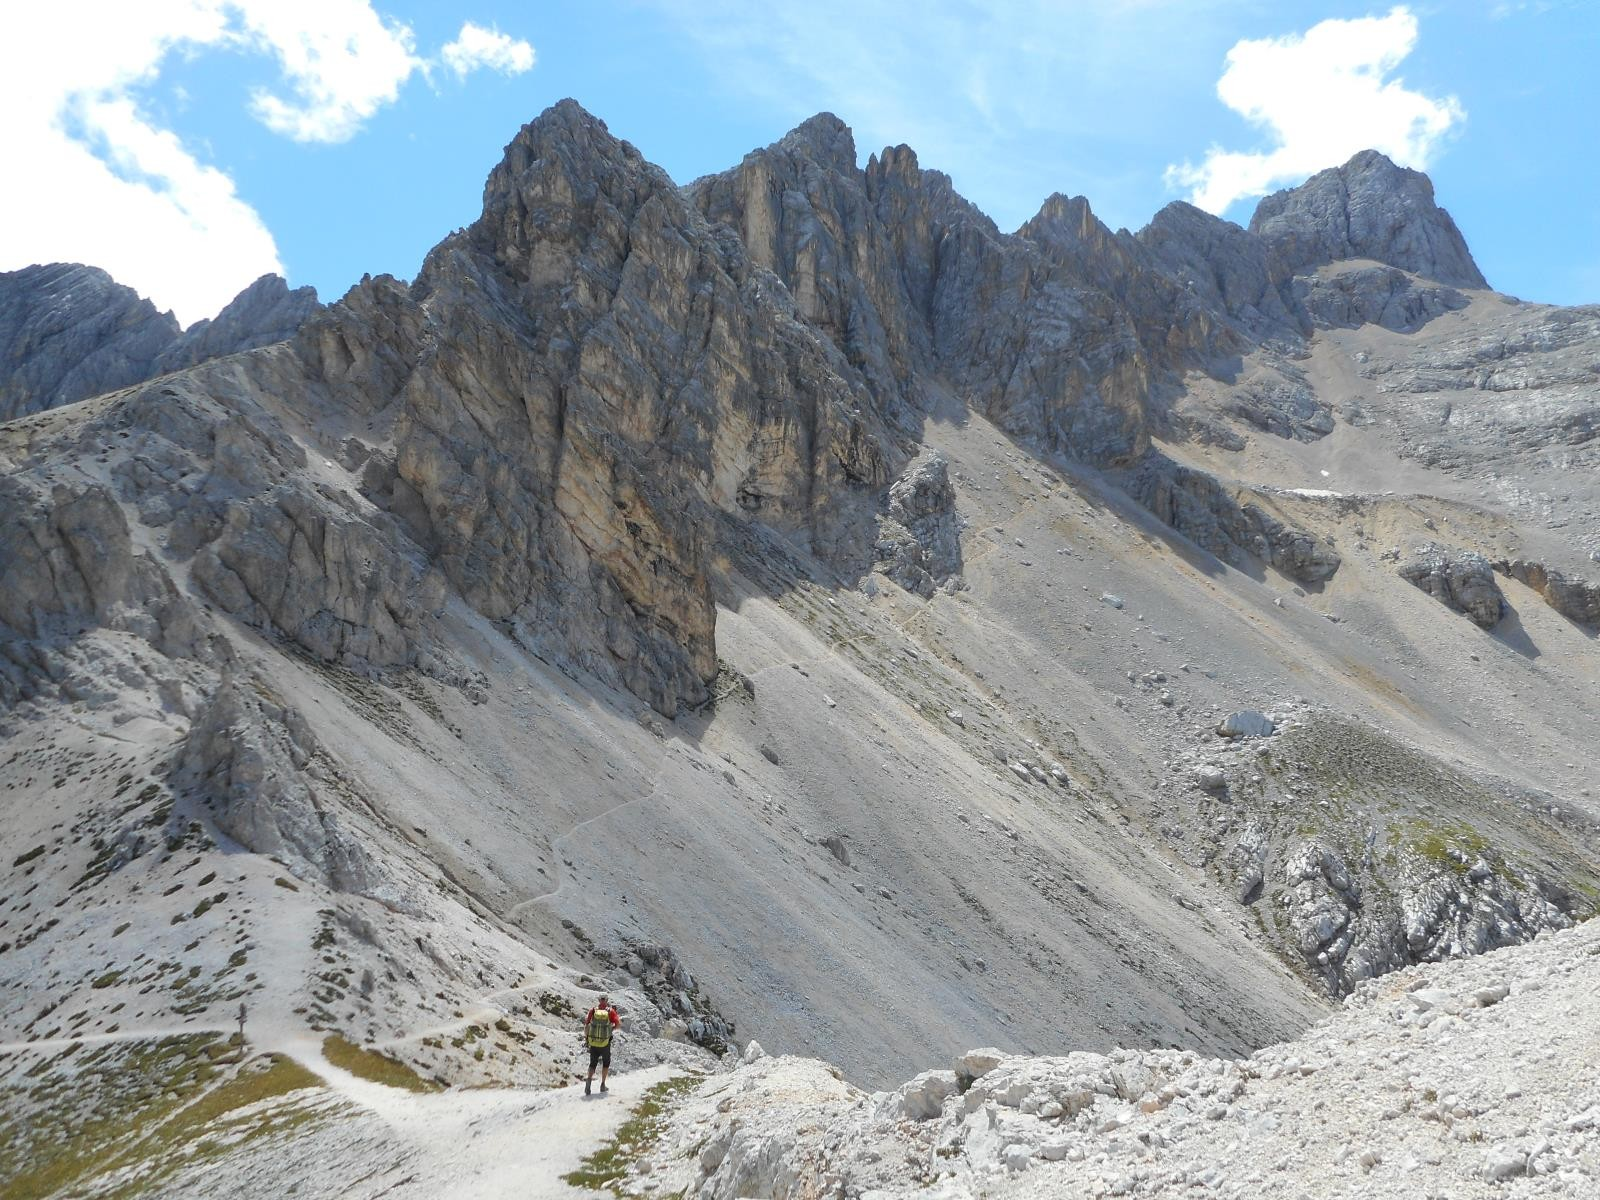 Gruppo del Sorapis, direction la Punta Negra (2847m)